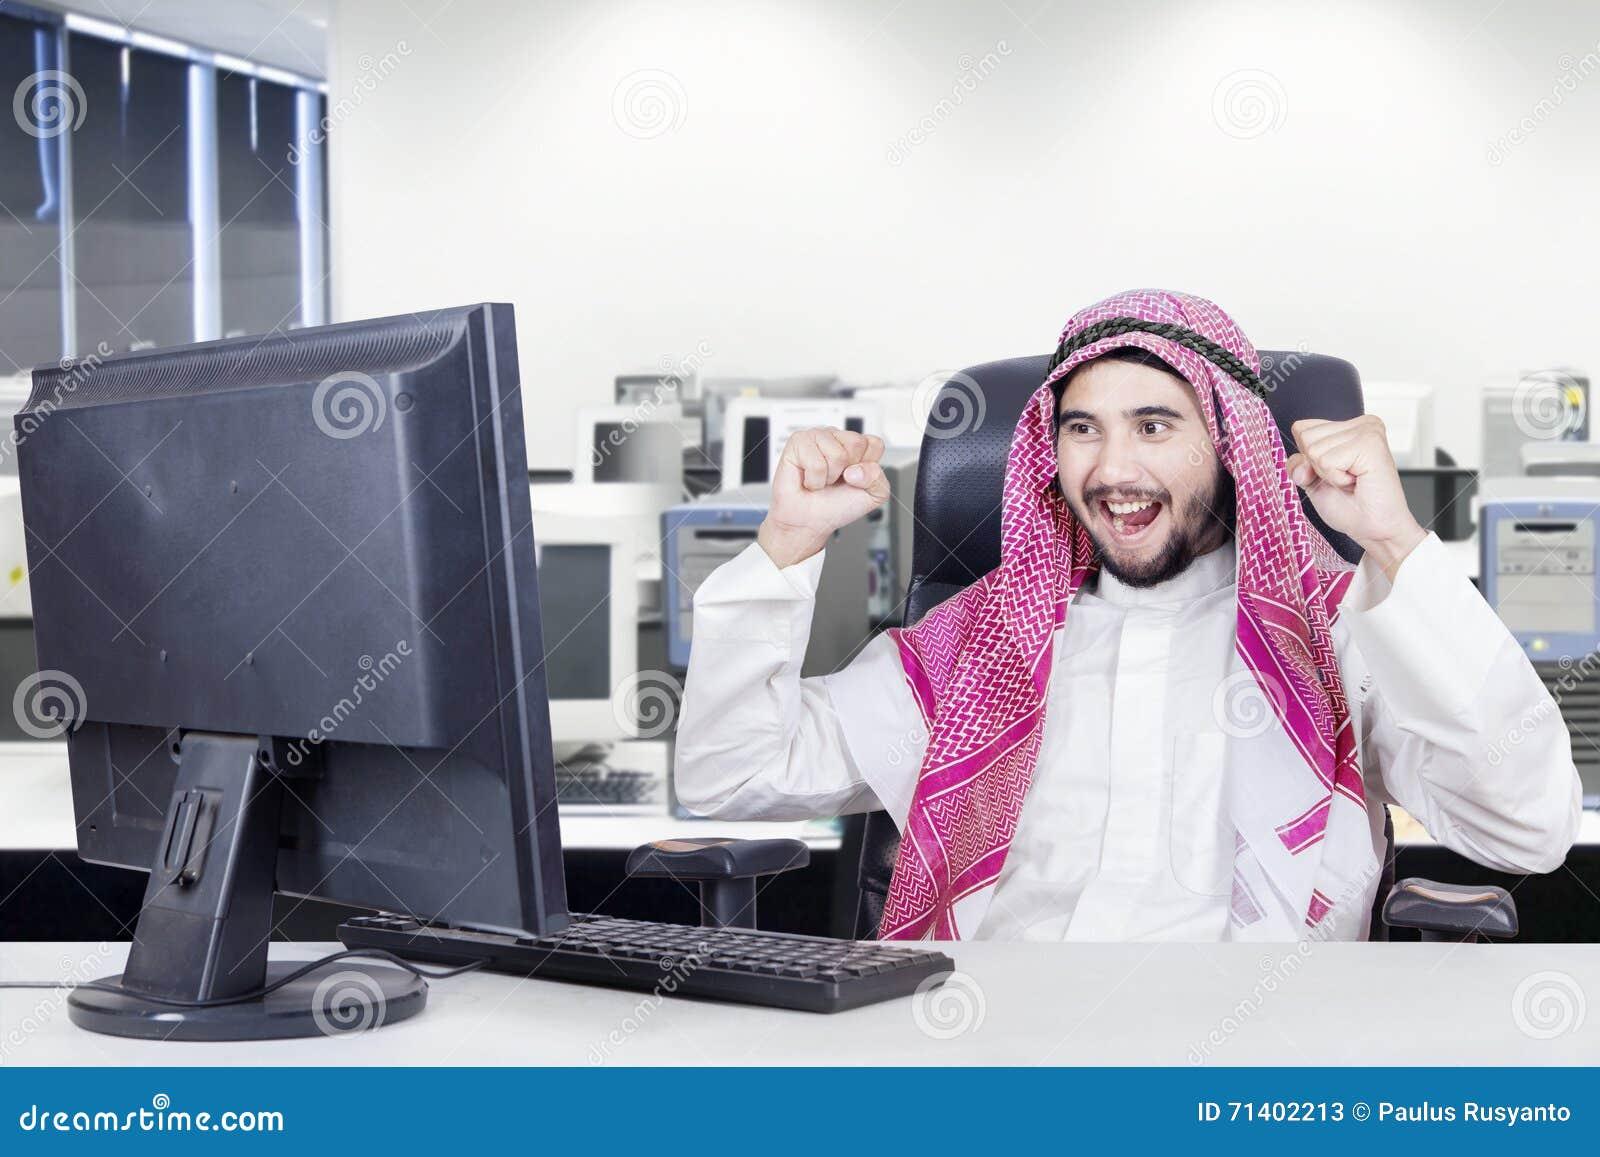 Arabian worker celebrates his success